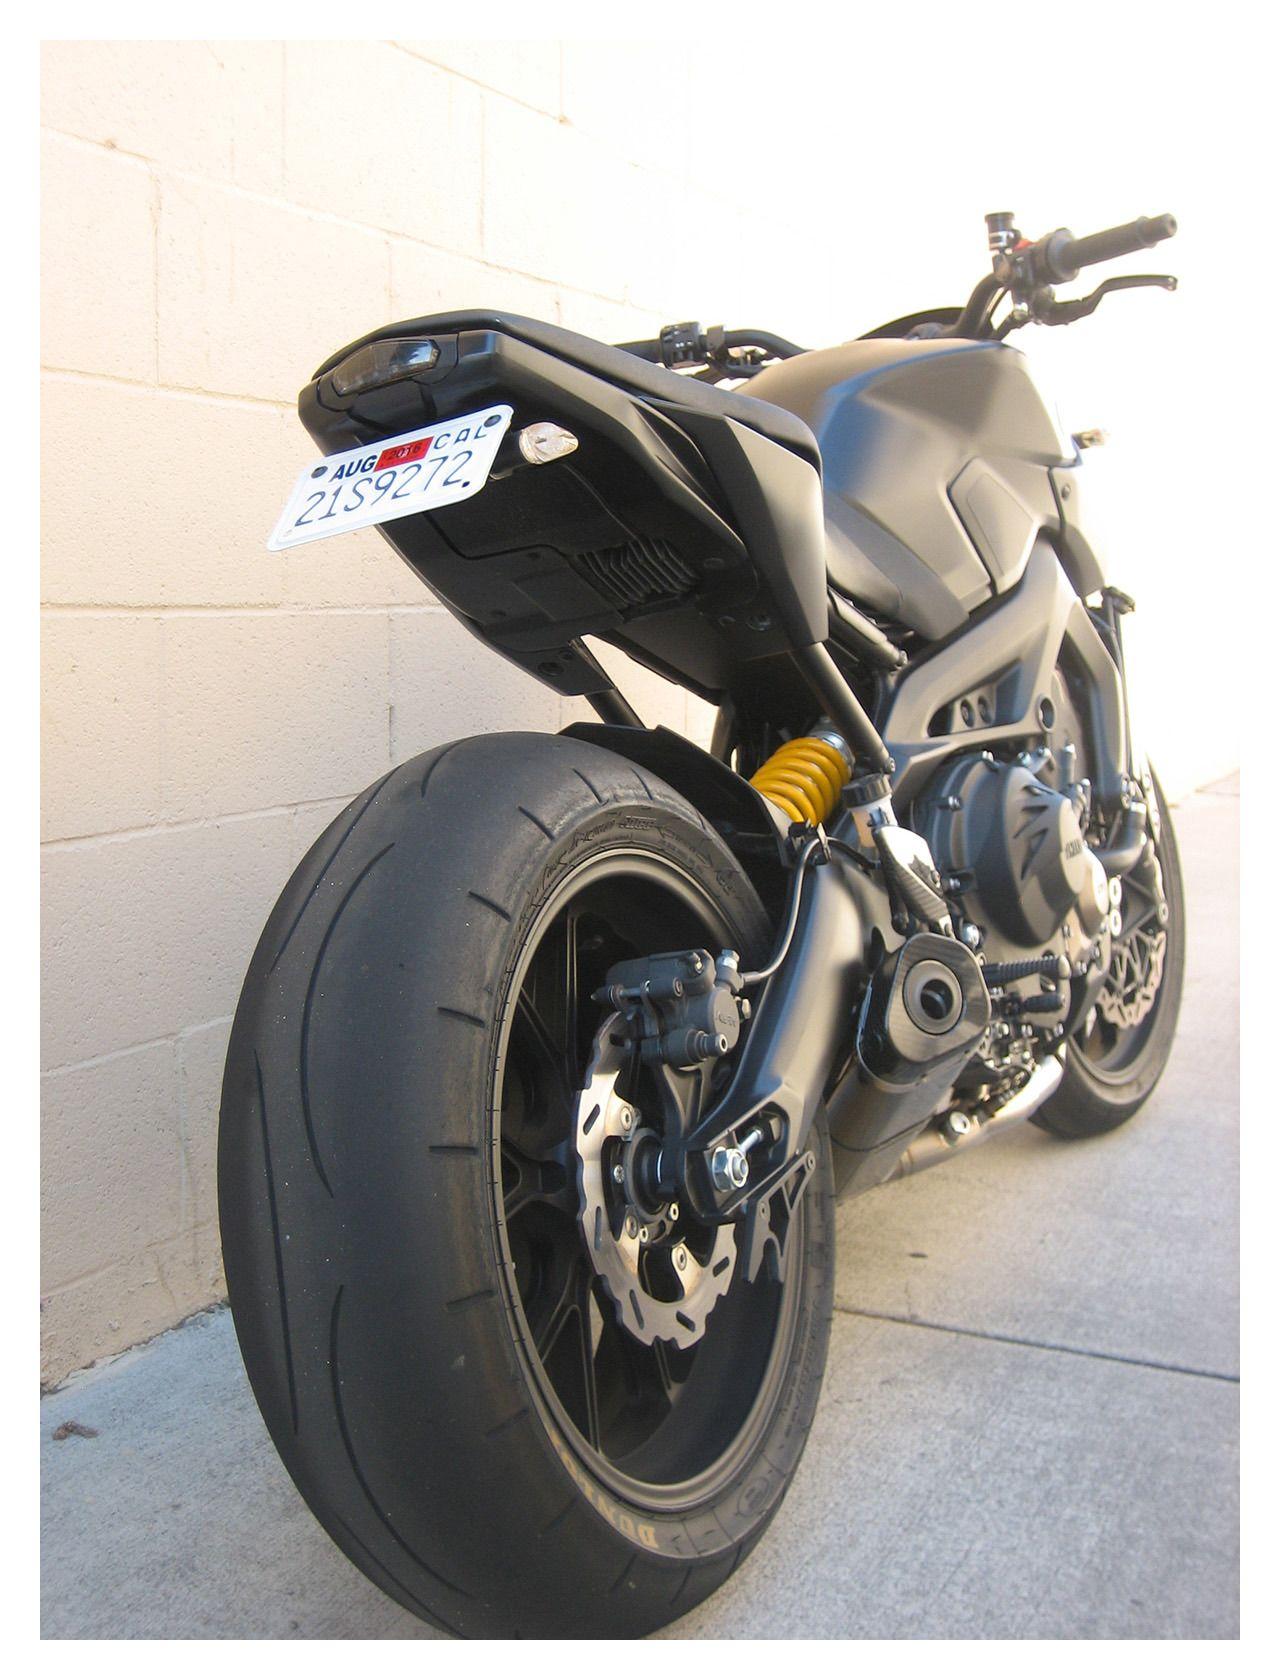 Graves Hexagonal Exhaust System Yamaha FZ-09 / MT-09 / FJ-09 ...